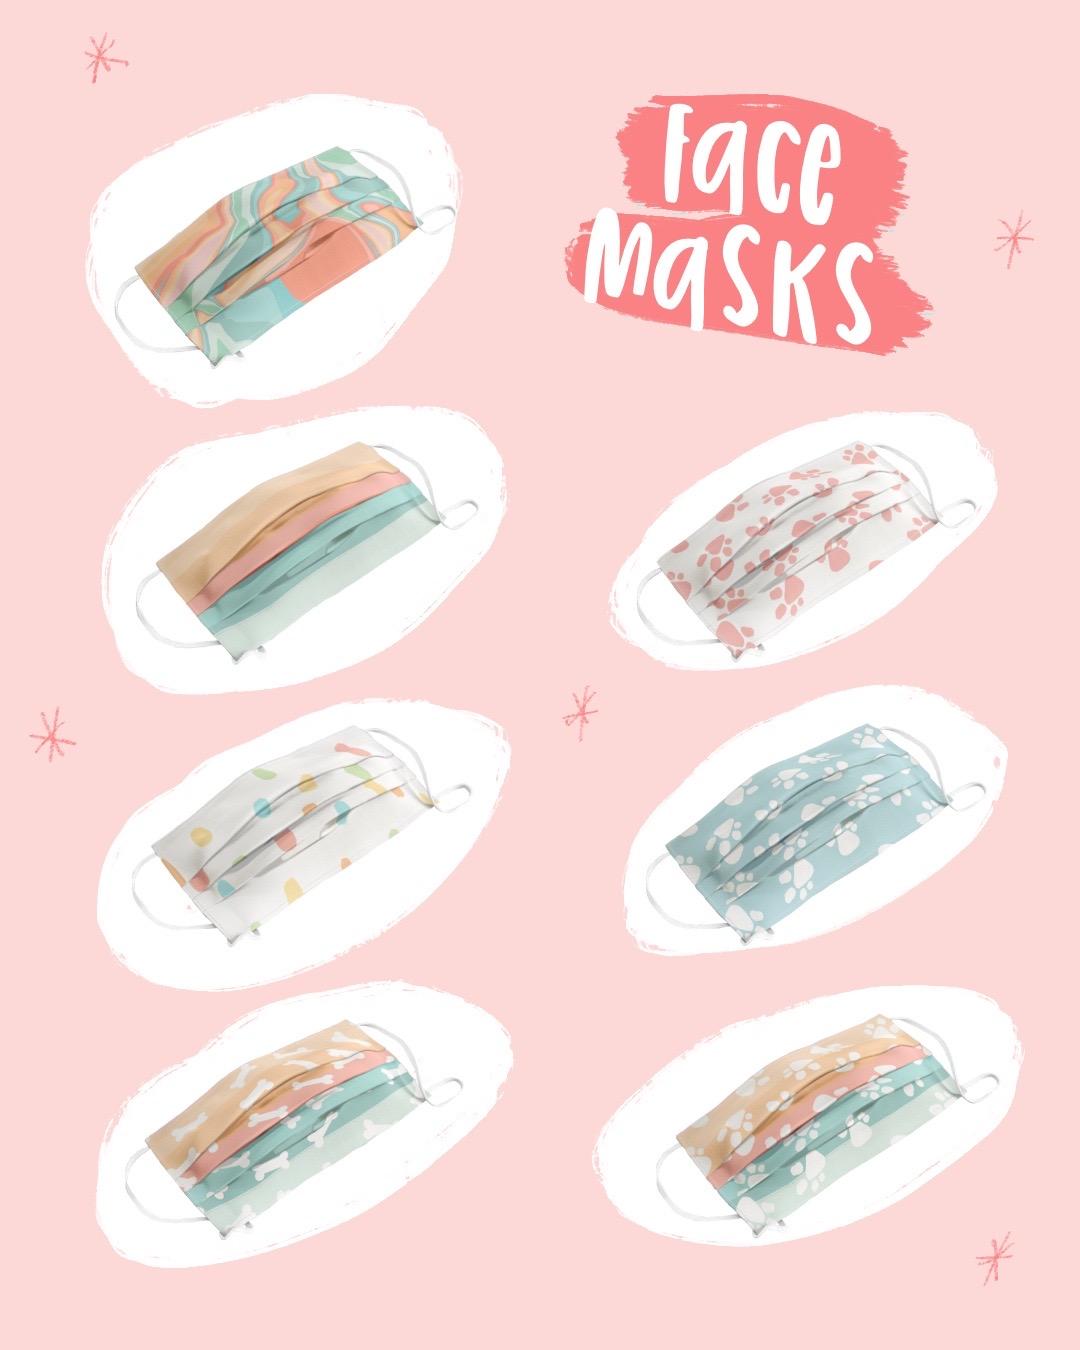 25 Sweetpeas Face Masks